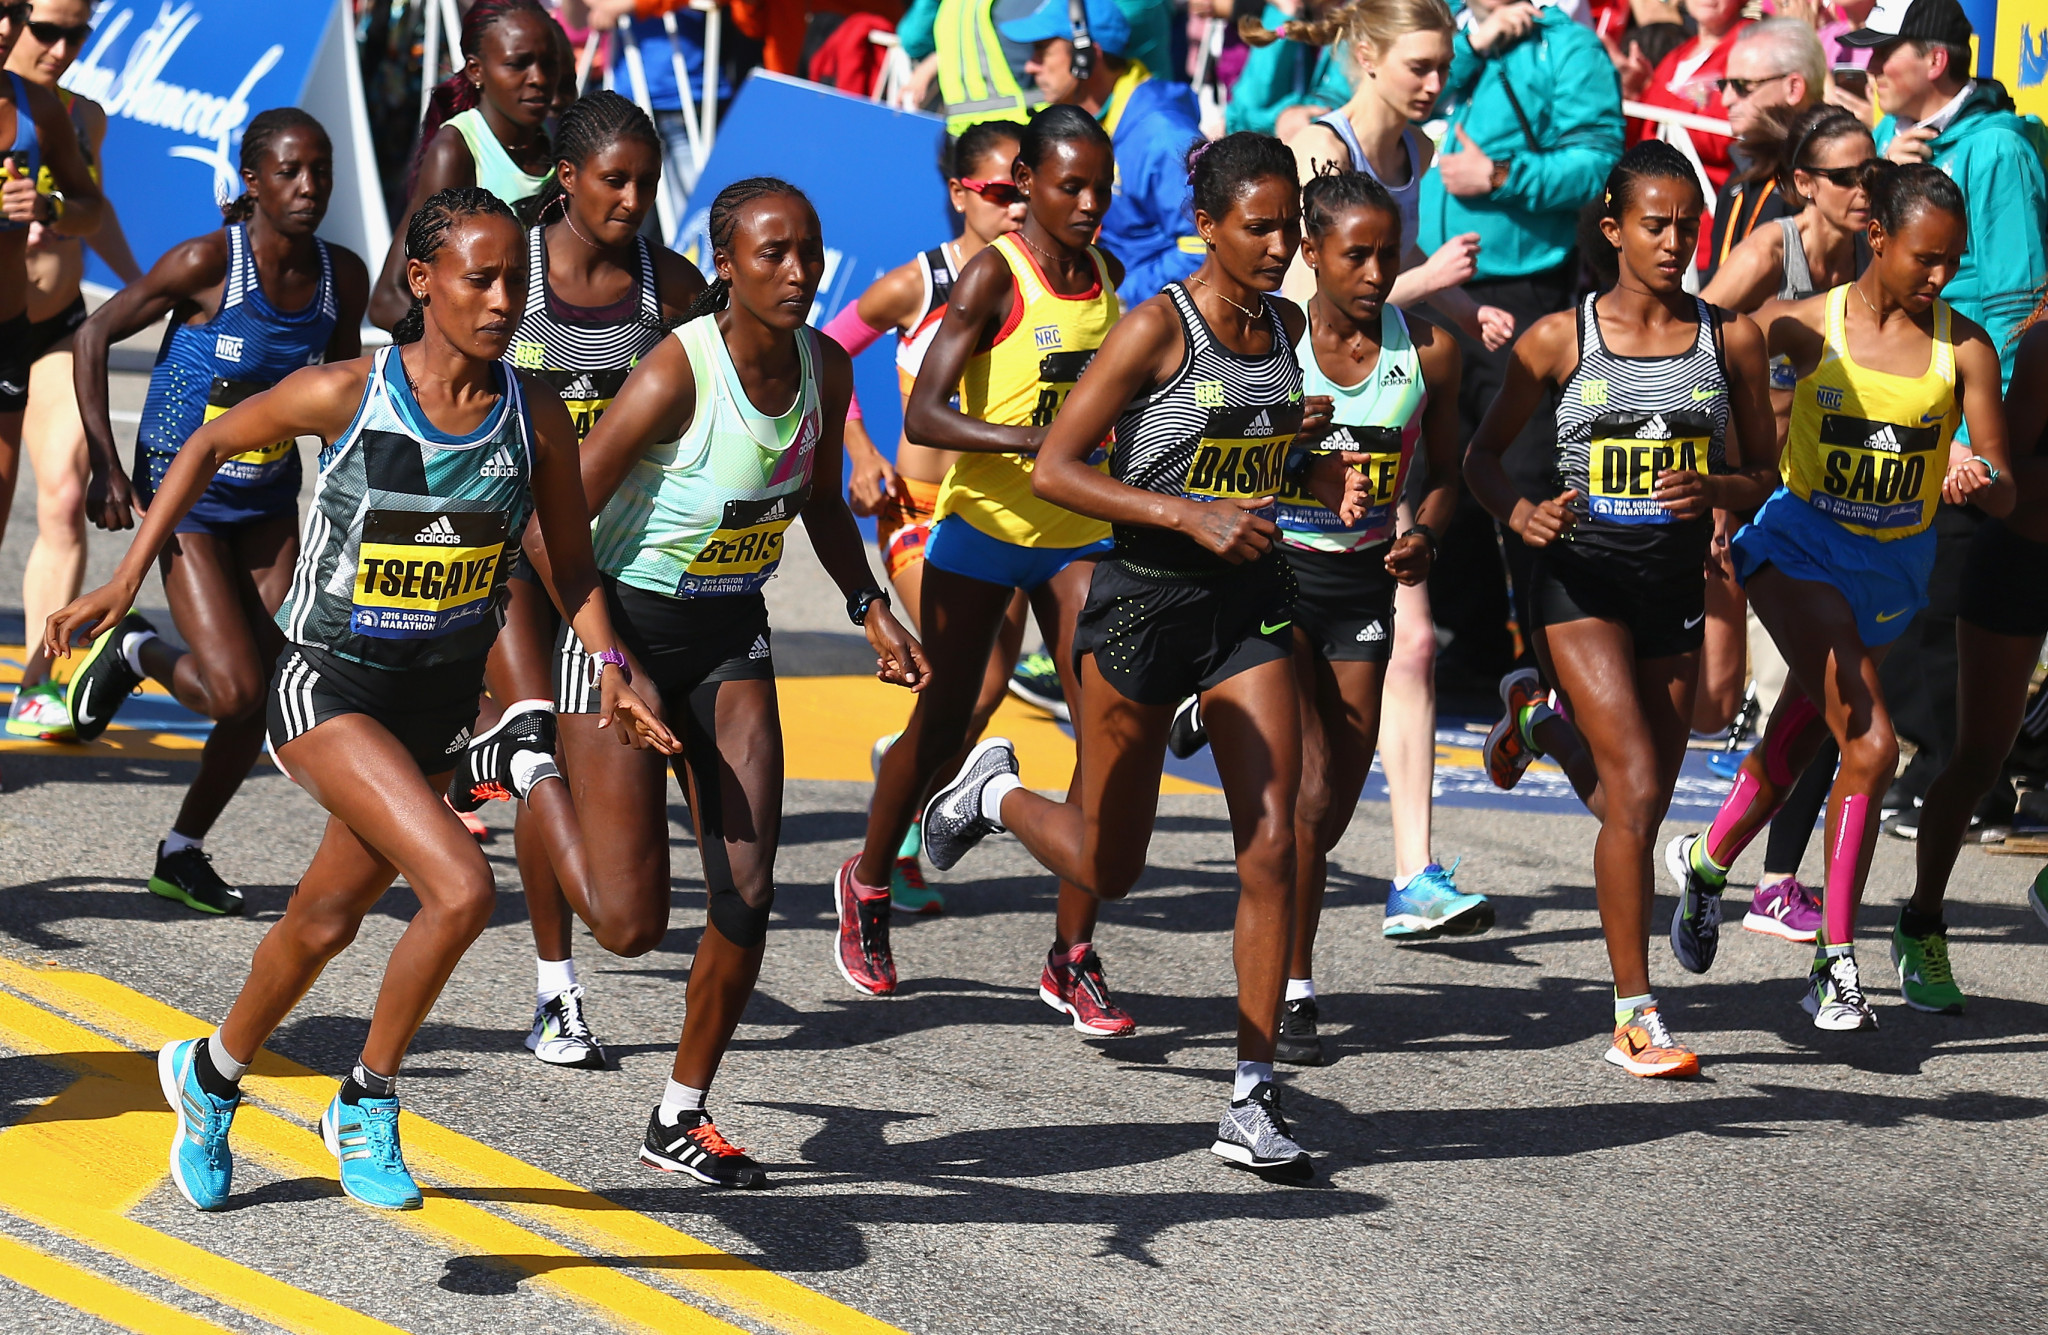 Boston Marathon organisers urge people not to run course on original date of postponed race